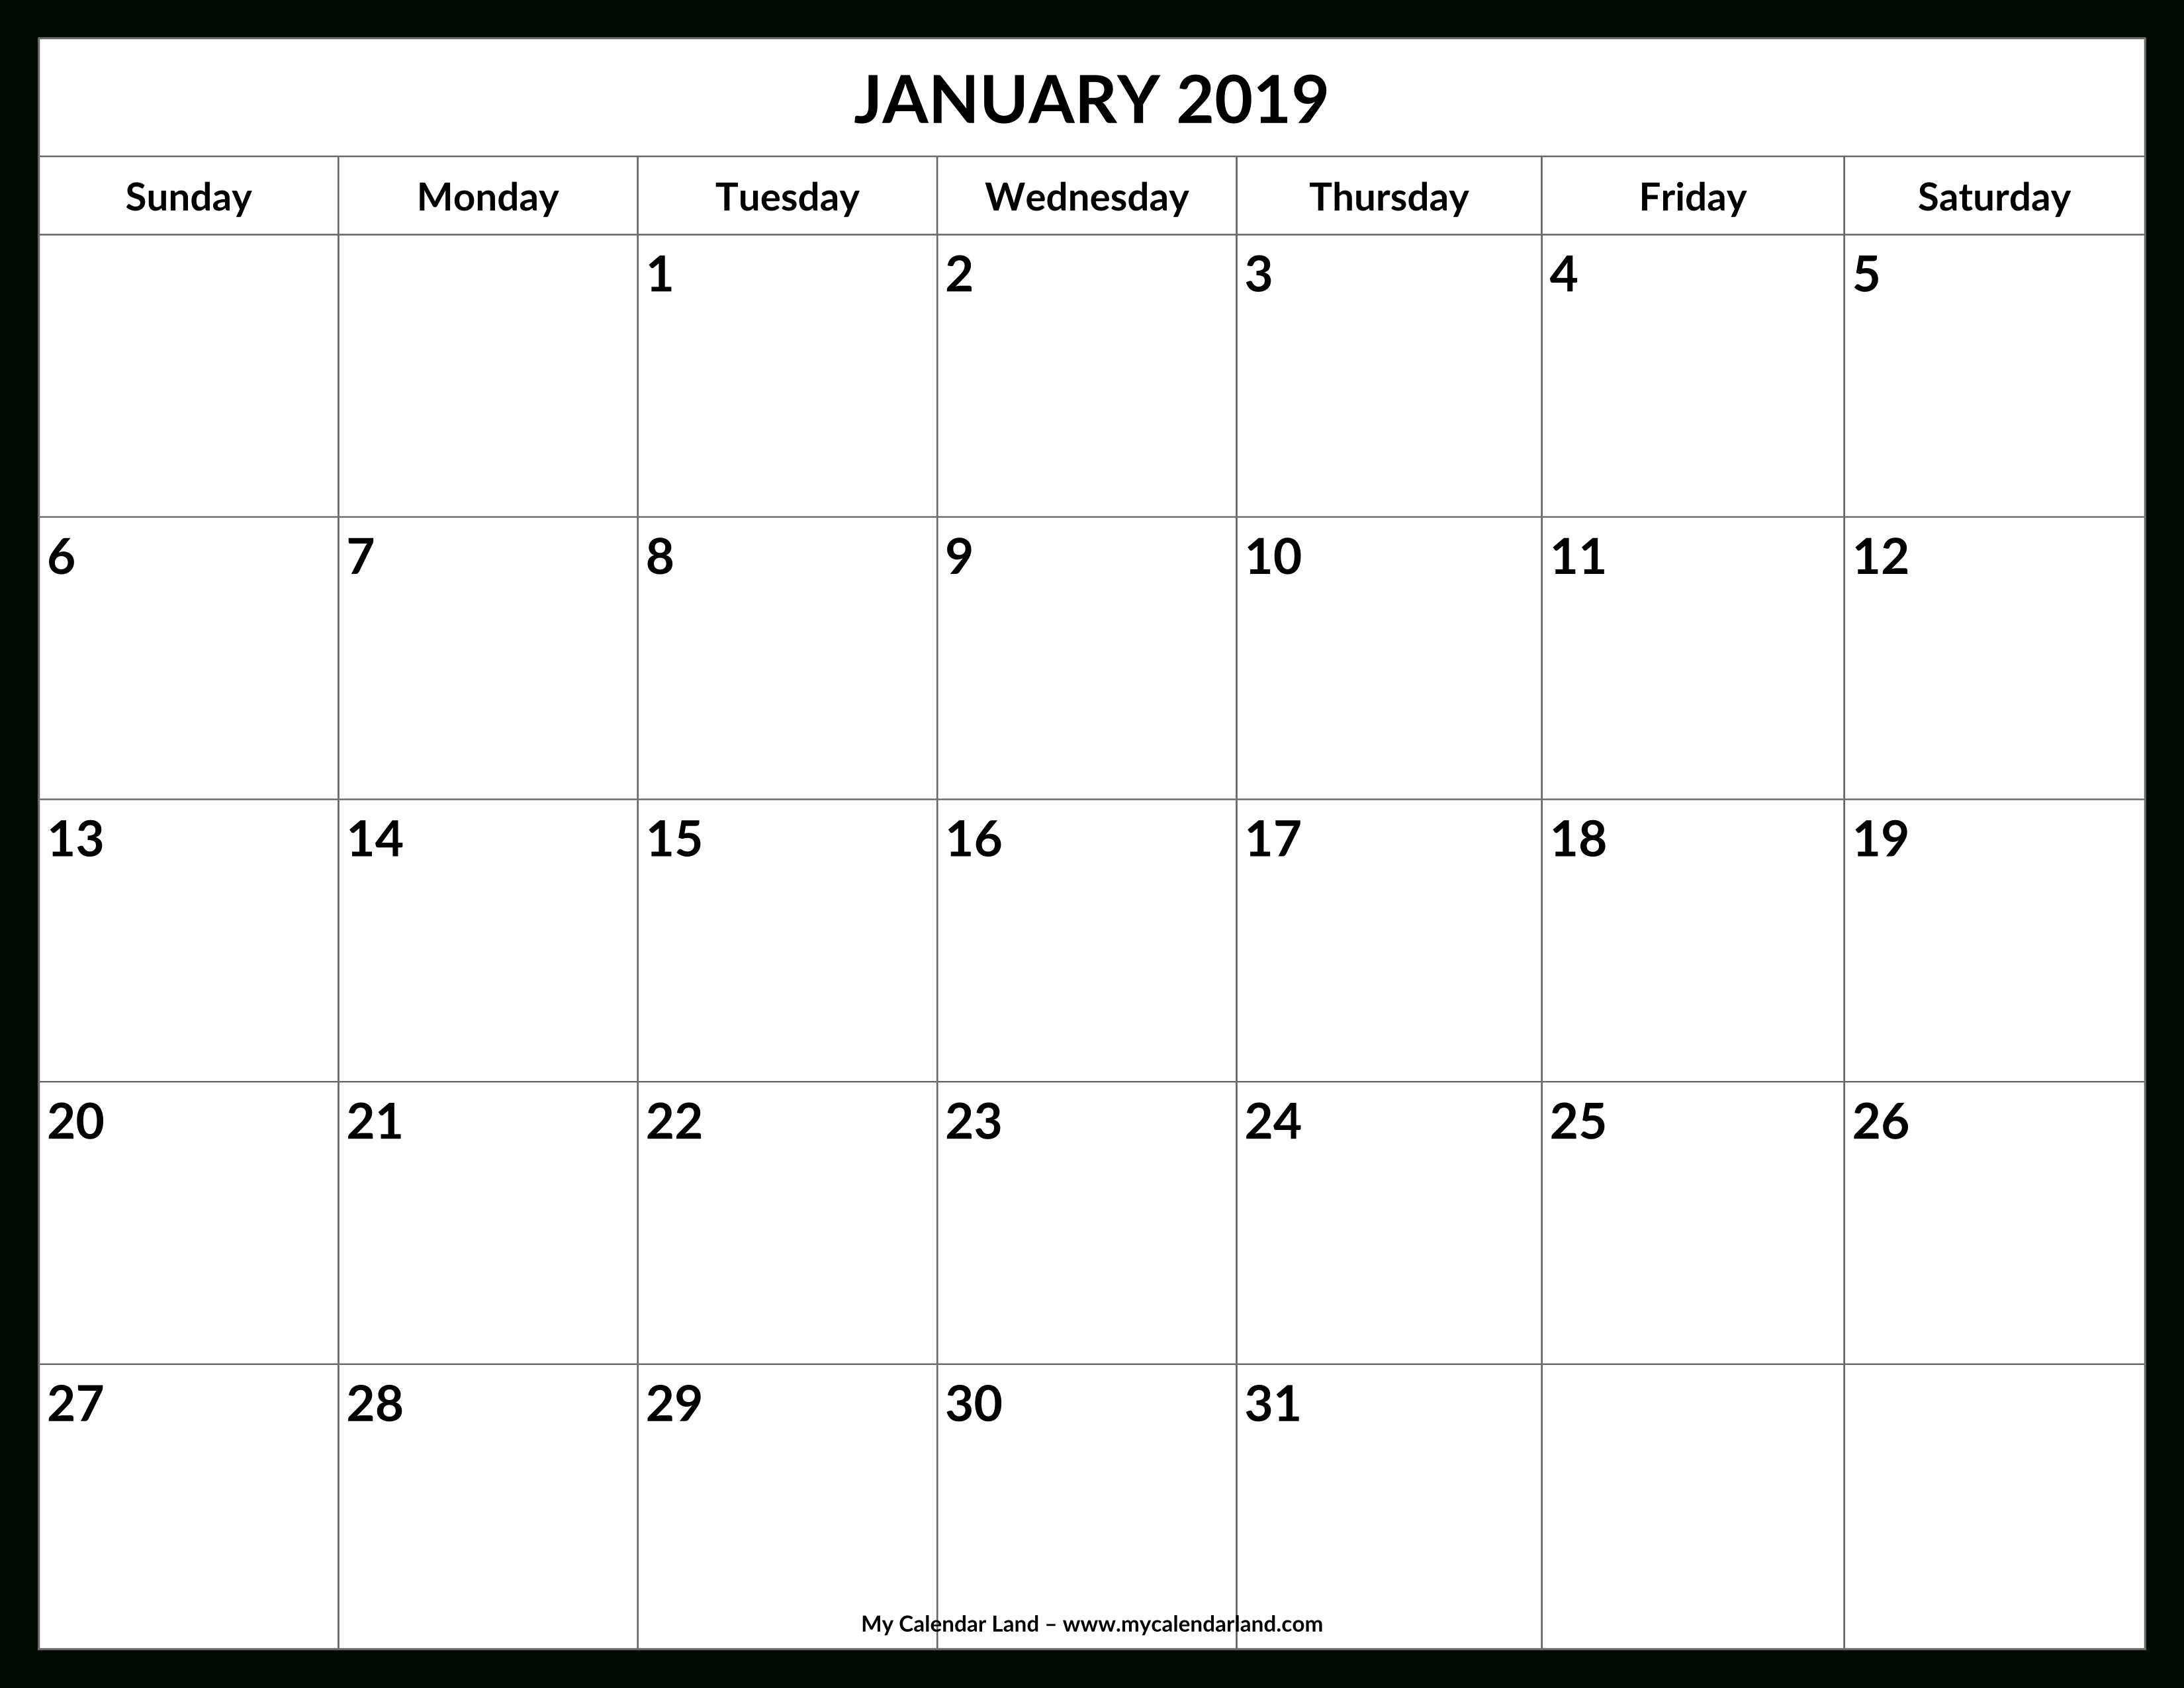 January 2019 Calendar – My Calendar Land Calendar 2019 Write In